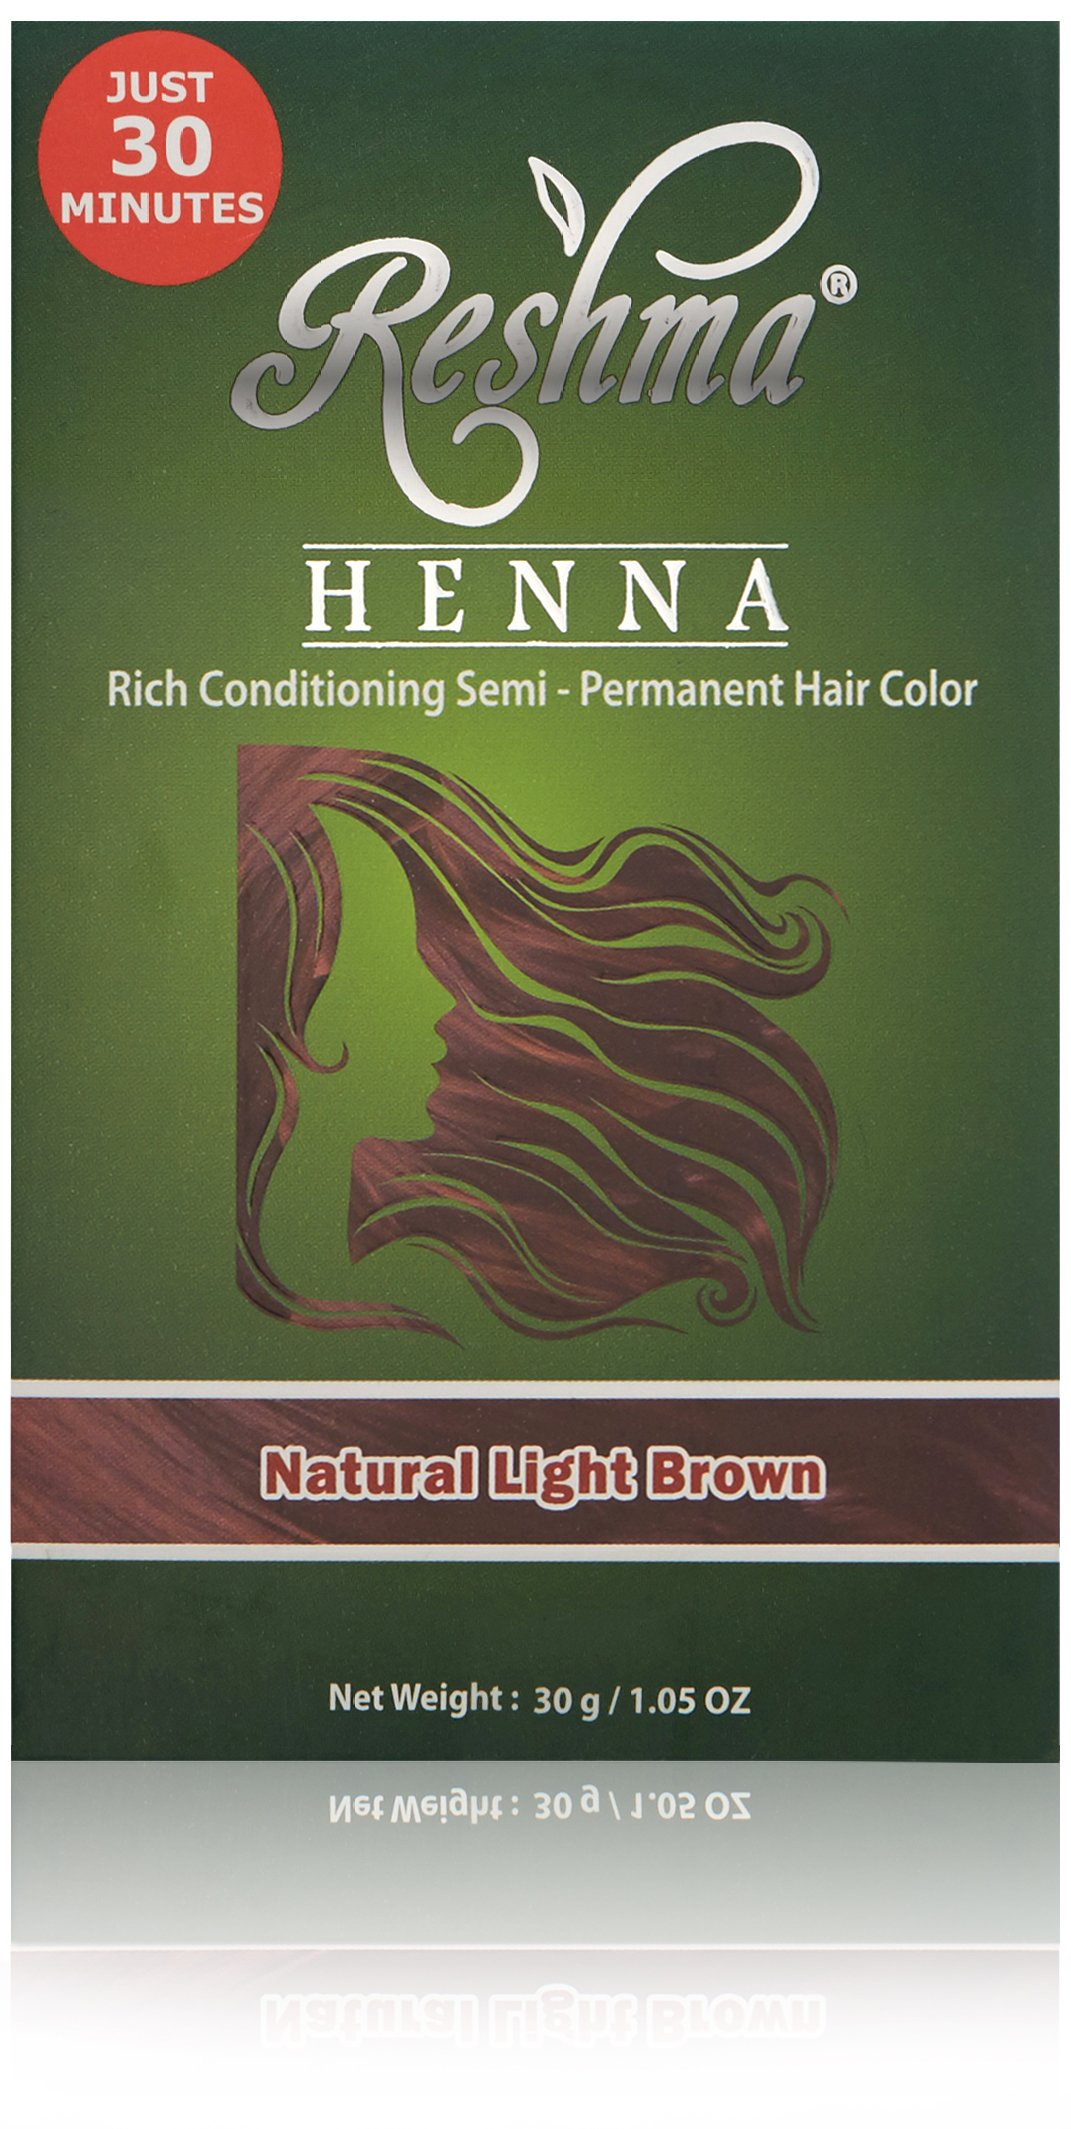 Amazon Reshma Beauty Natural Dark Brown 30 Minute Henna Hair